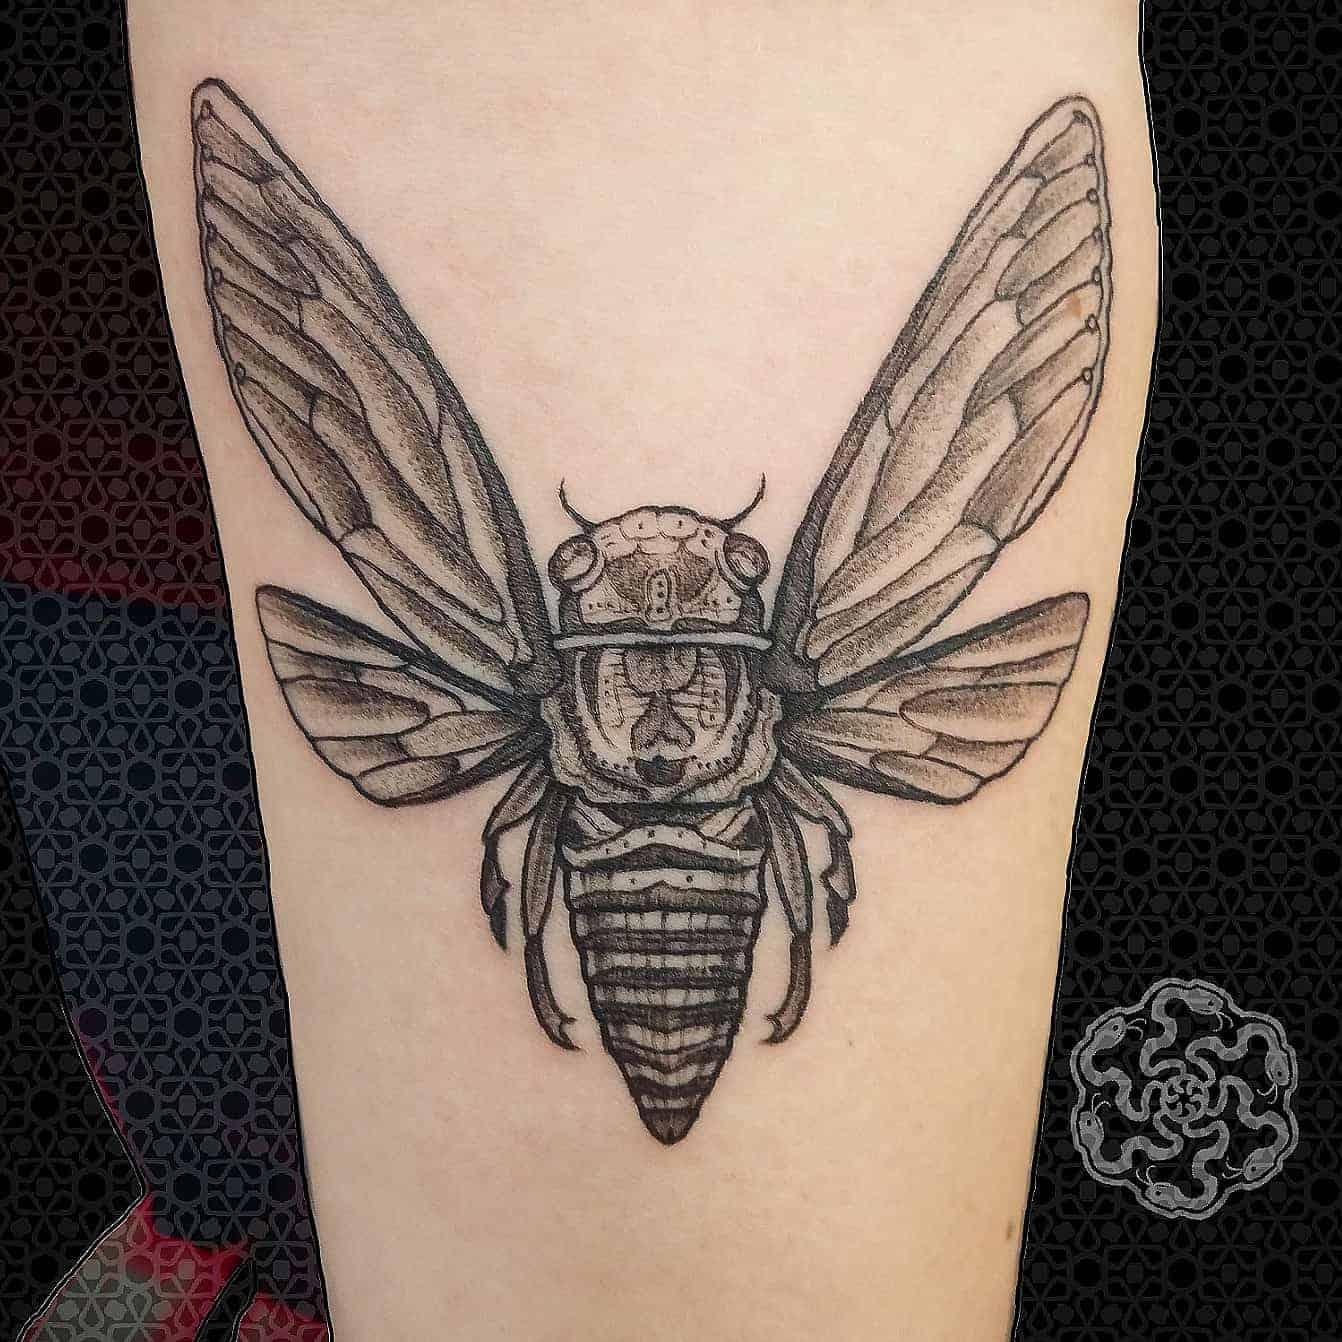 blackwork tattoo of a cicada on a forearm